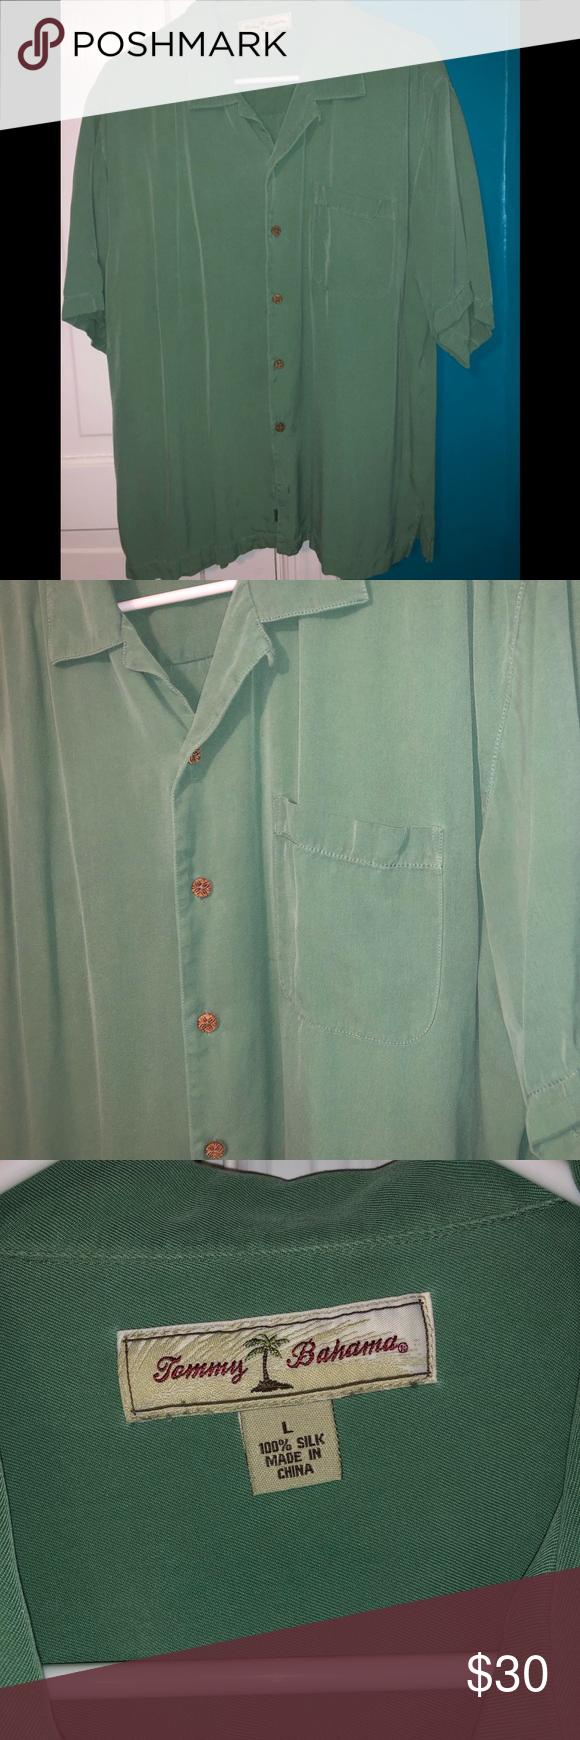 Men S Tommy Bahama Shirt Sage Green Sage Green Tommy Bahama Shirt Size Large 100 Silk Gently Wo Tommy Bahama Shirts Casual Shirts For Men Casual Shirts